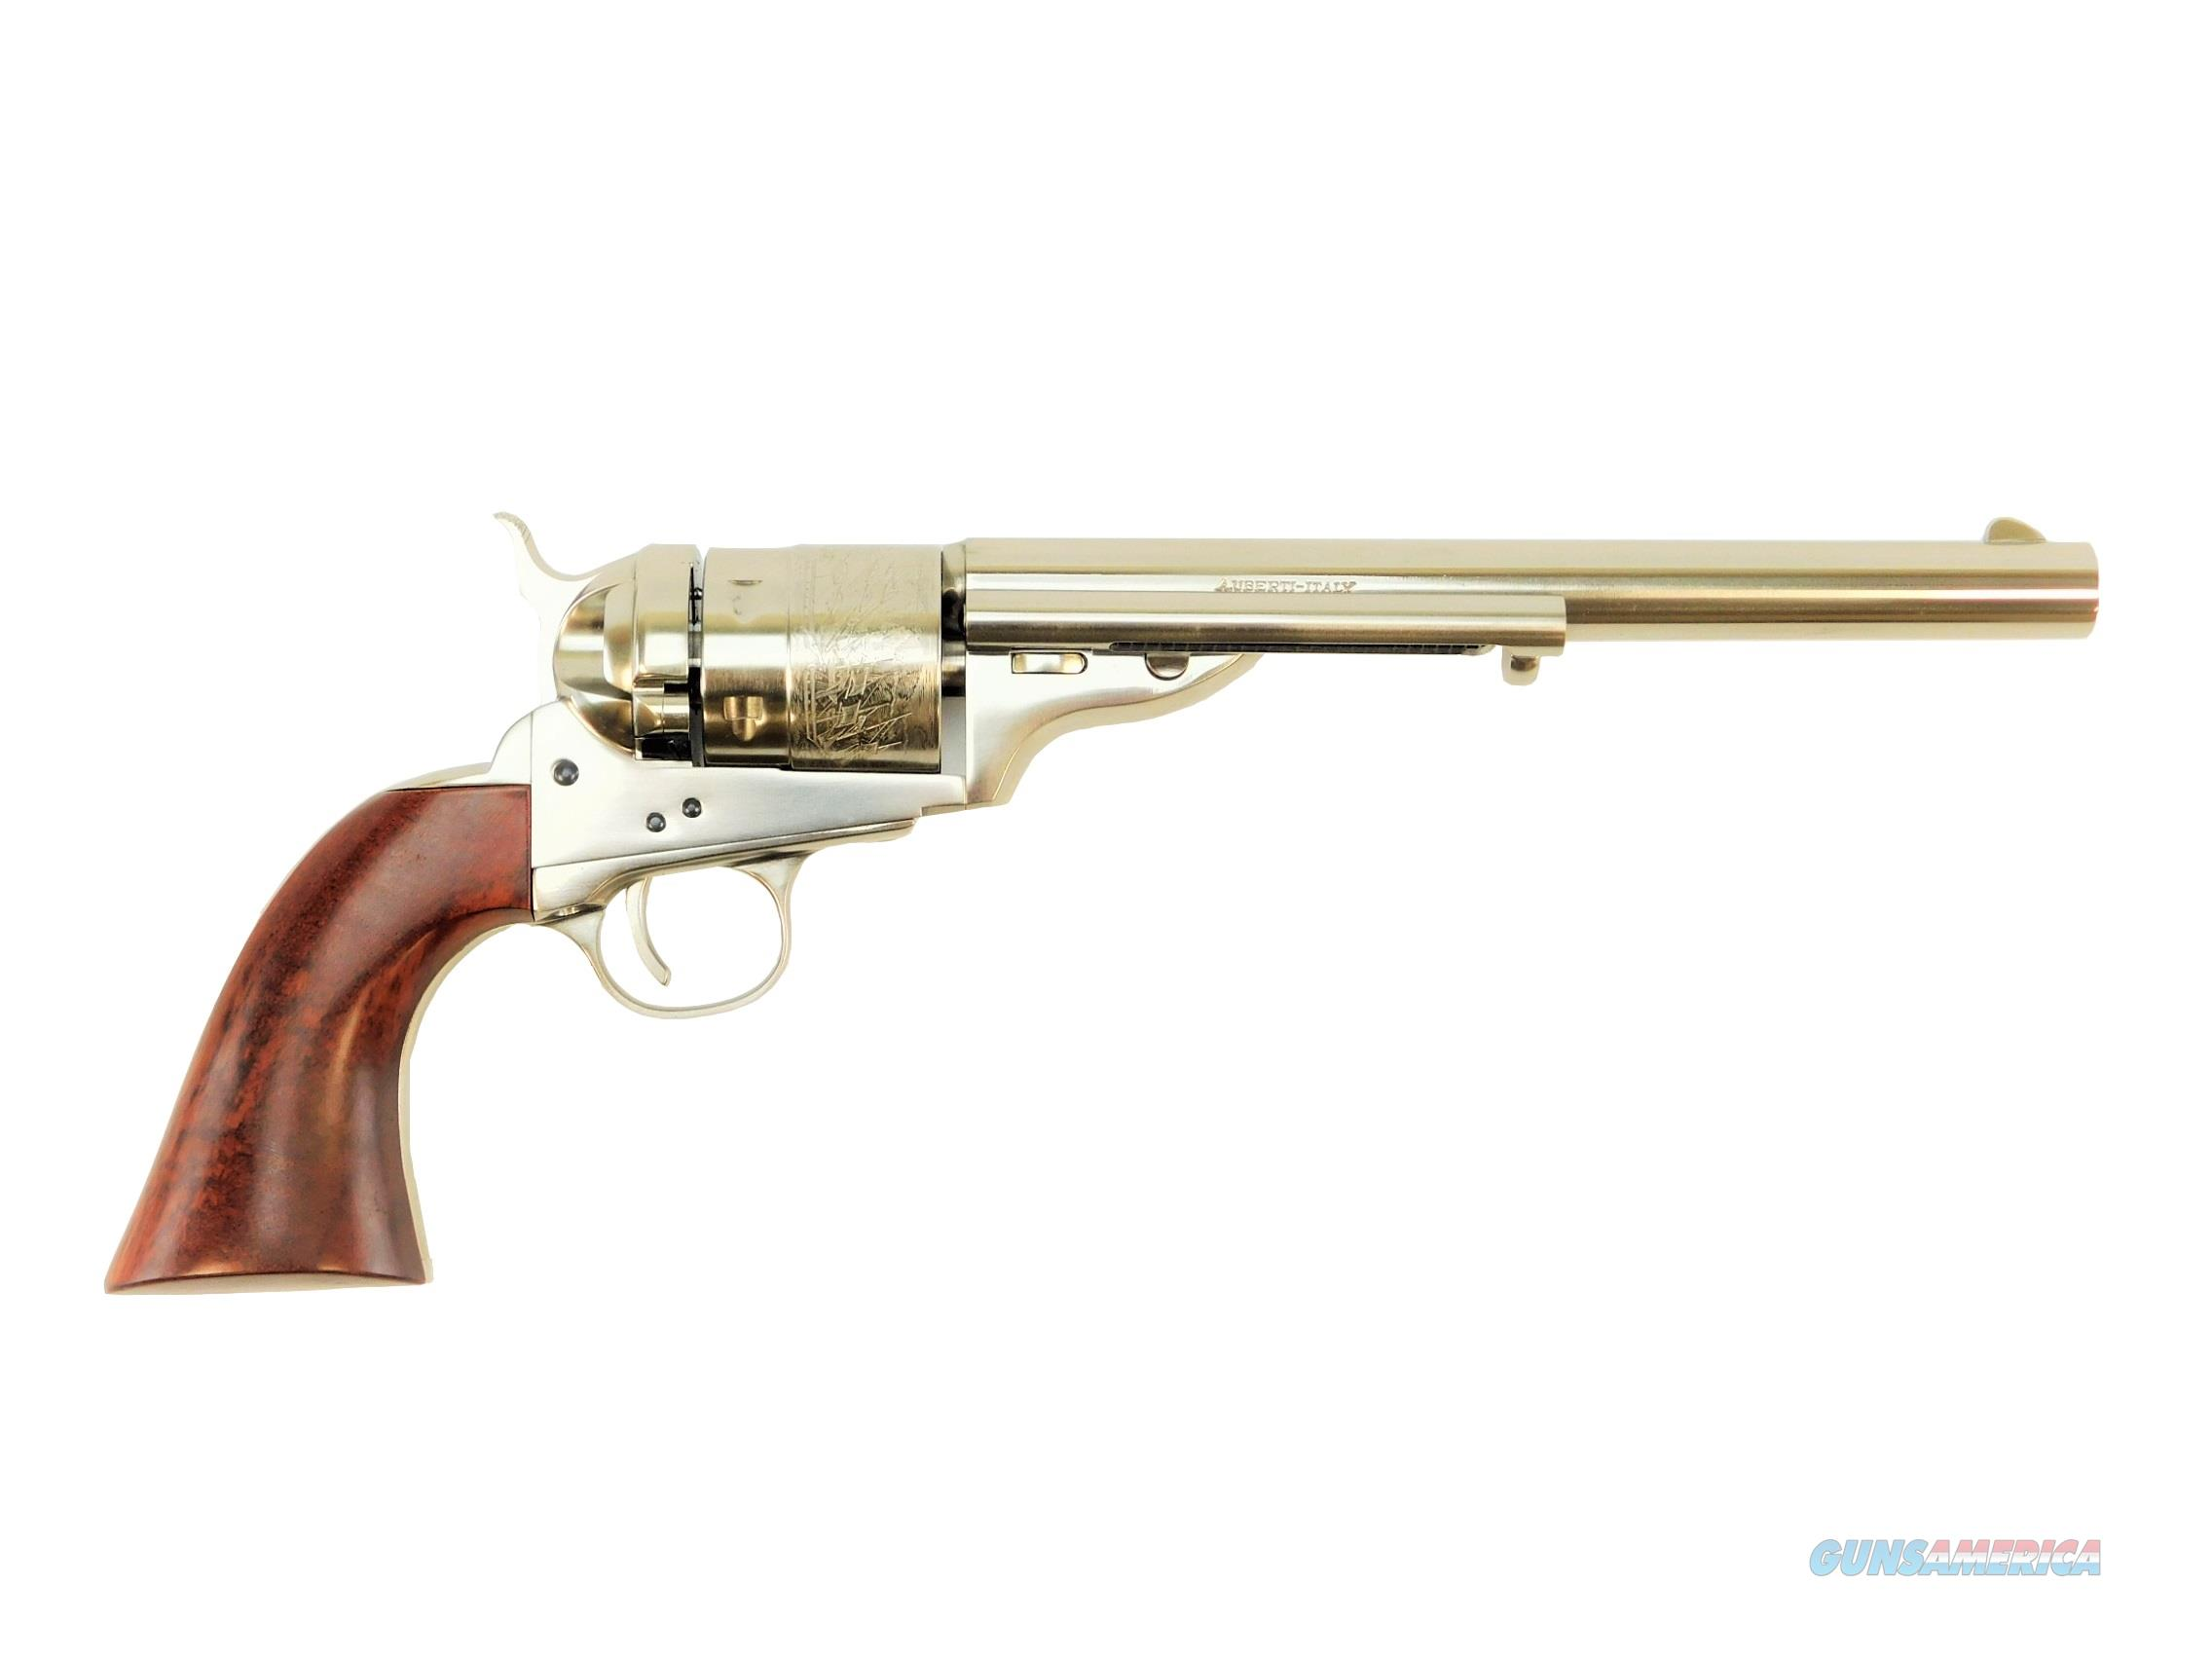 "Taylor's & Co. C Mason 1860 Army Nickel .45 LC 8"" REV9031N00  Guns > Pistols > Taylors & Co. Pistols > Ctg."